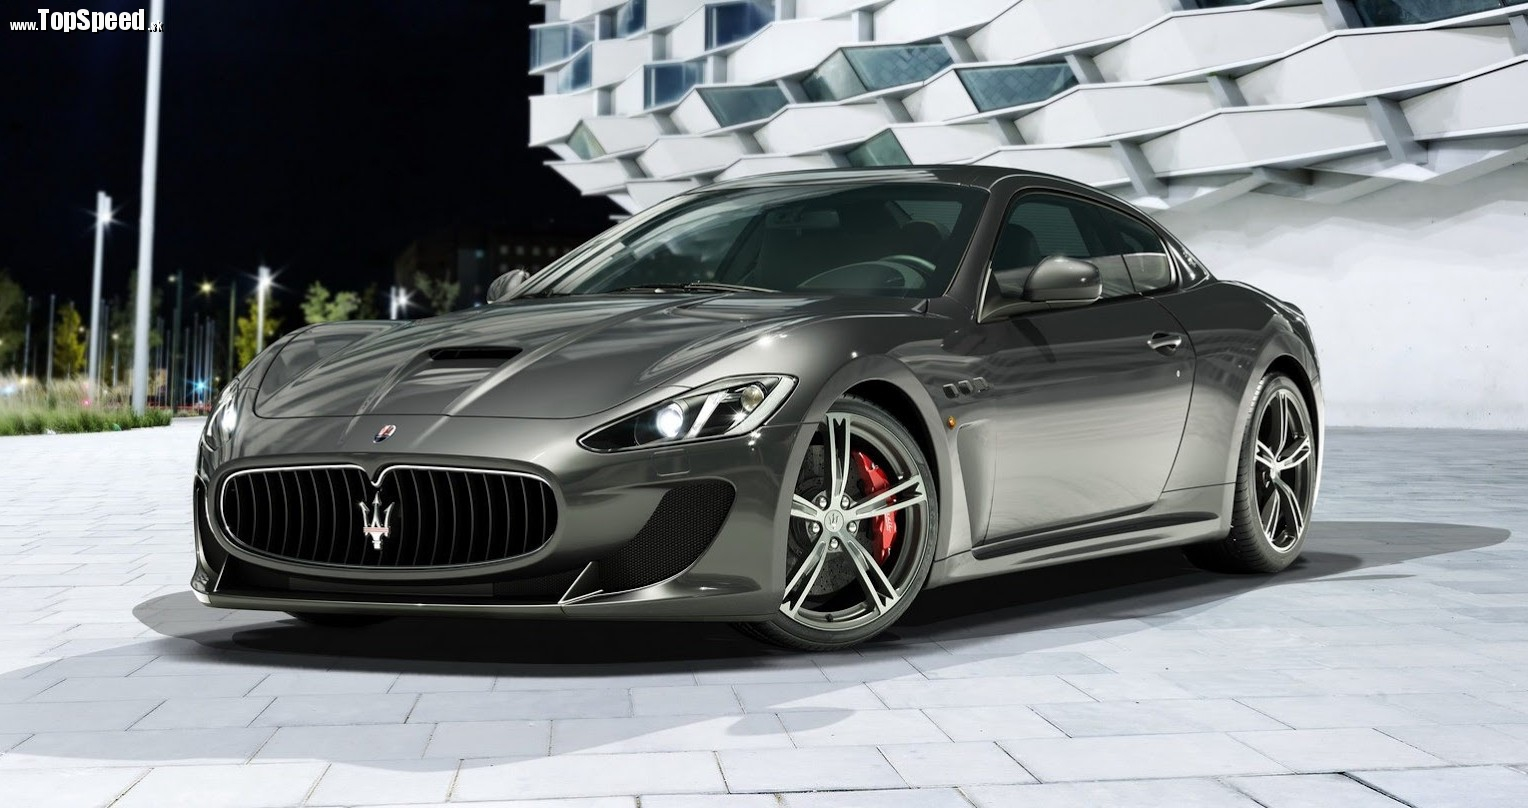 Vpredu Maserati pridalo novú karbónovú kapotu. Možno kvôli hmotnosti.